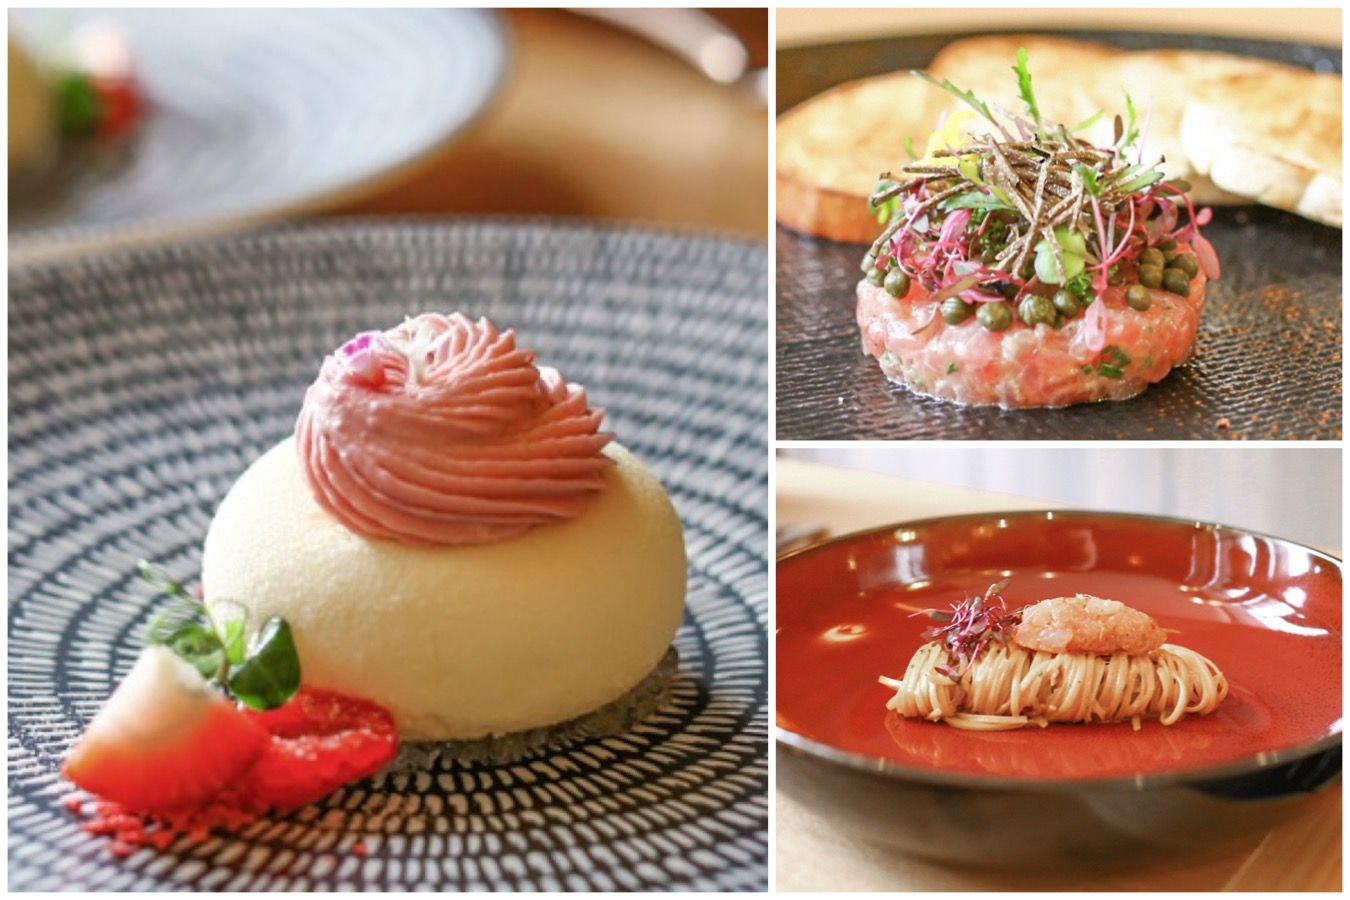 Braci - Michelin-Starred Modern Italian Restaurant With Open-Kitchen Concept, At Boat Quay